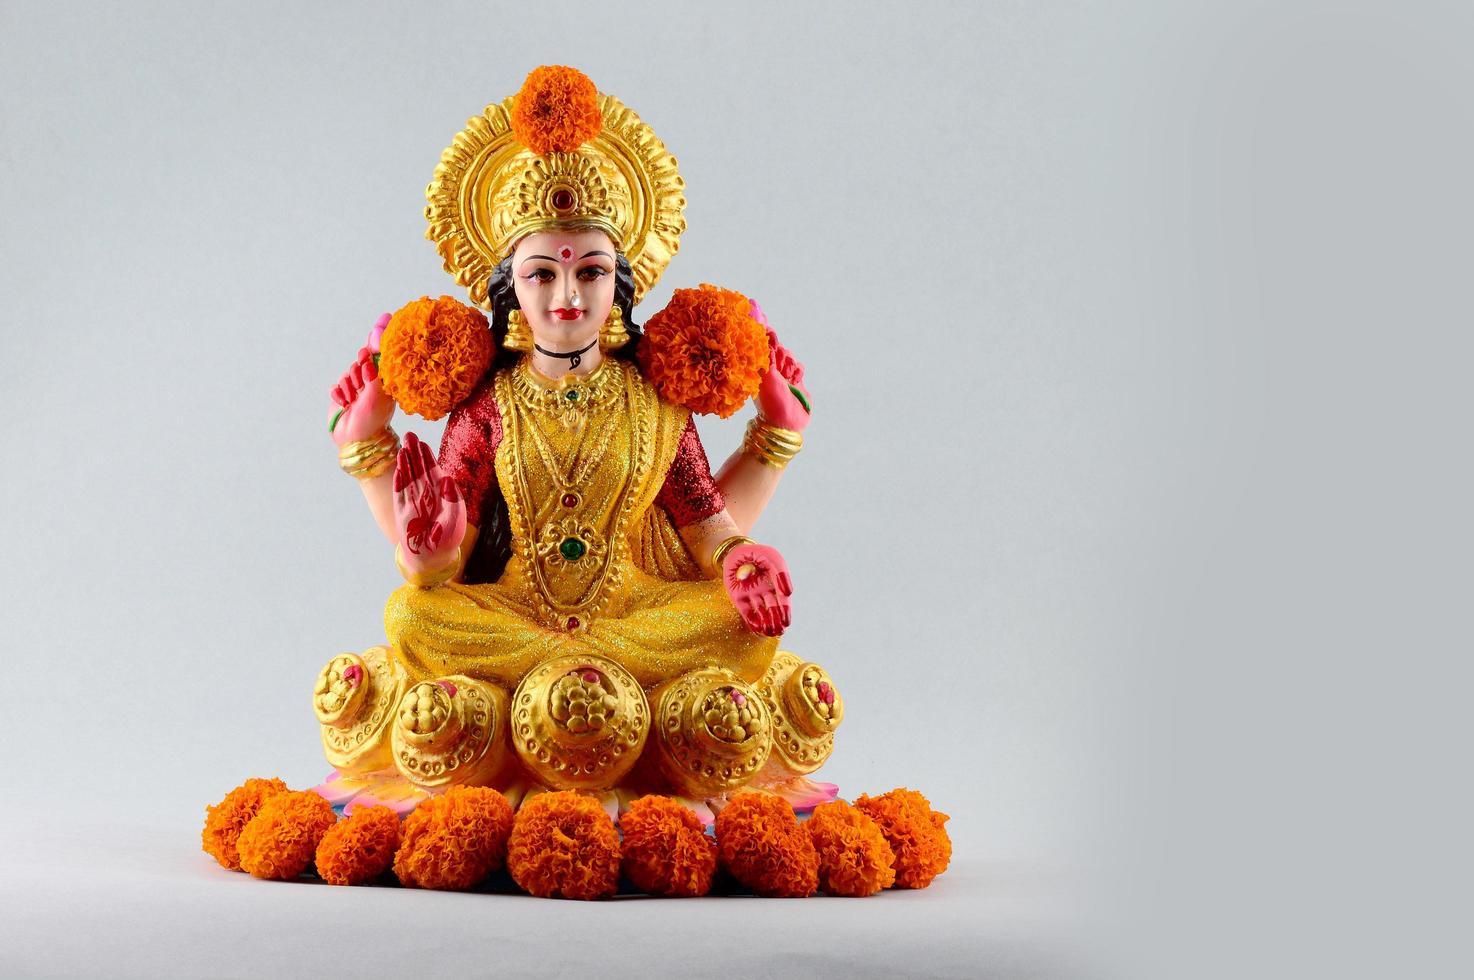 primo piano di una statua lakshmi foto